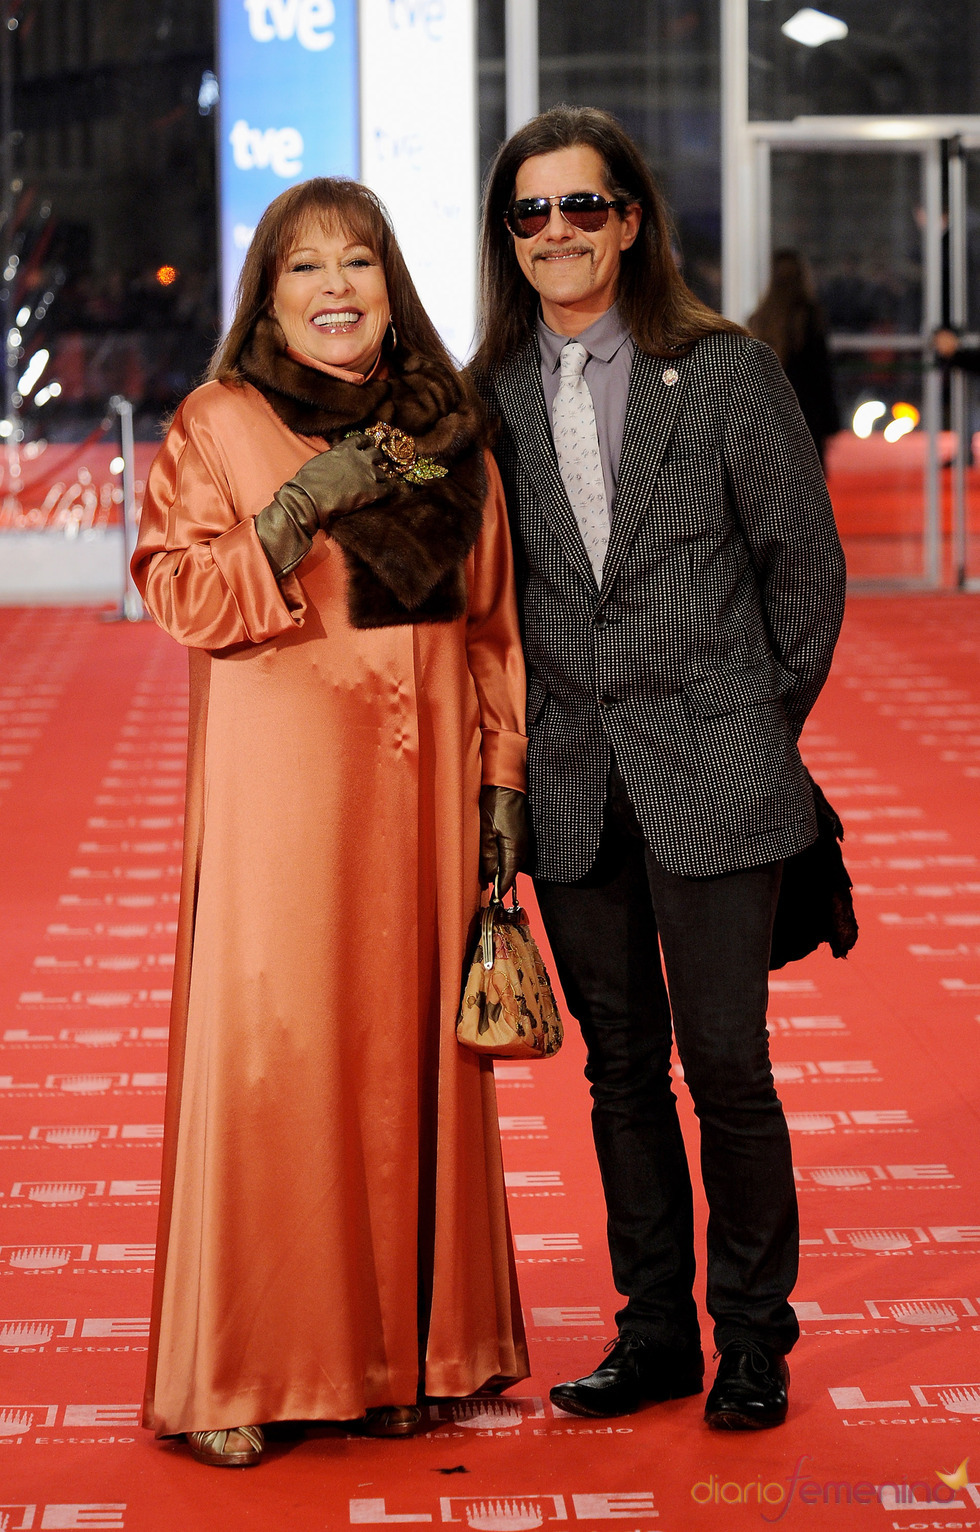 Massiel en la alfombra roja de los Goya 2011